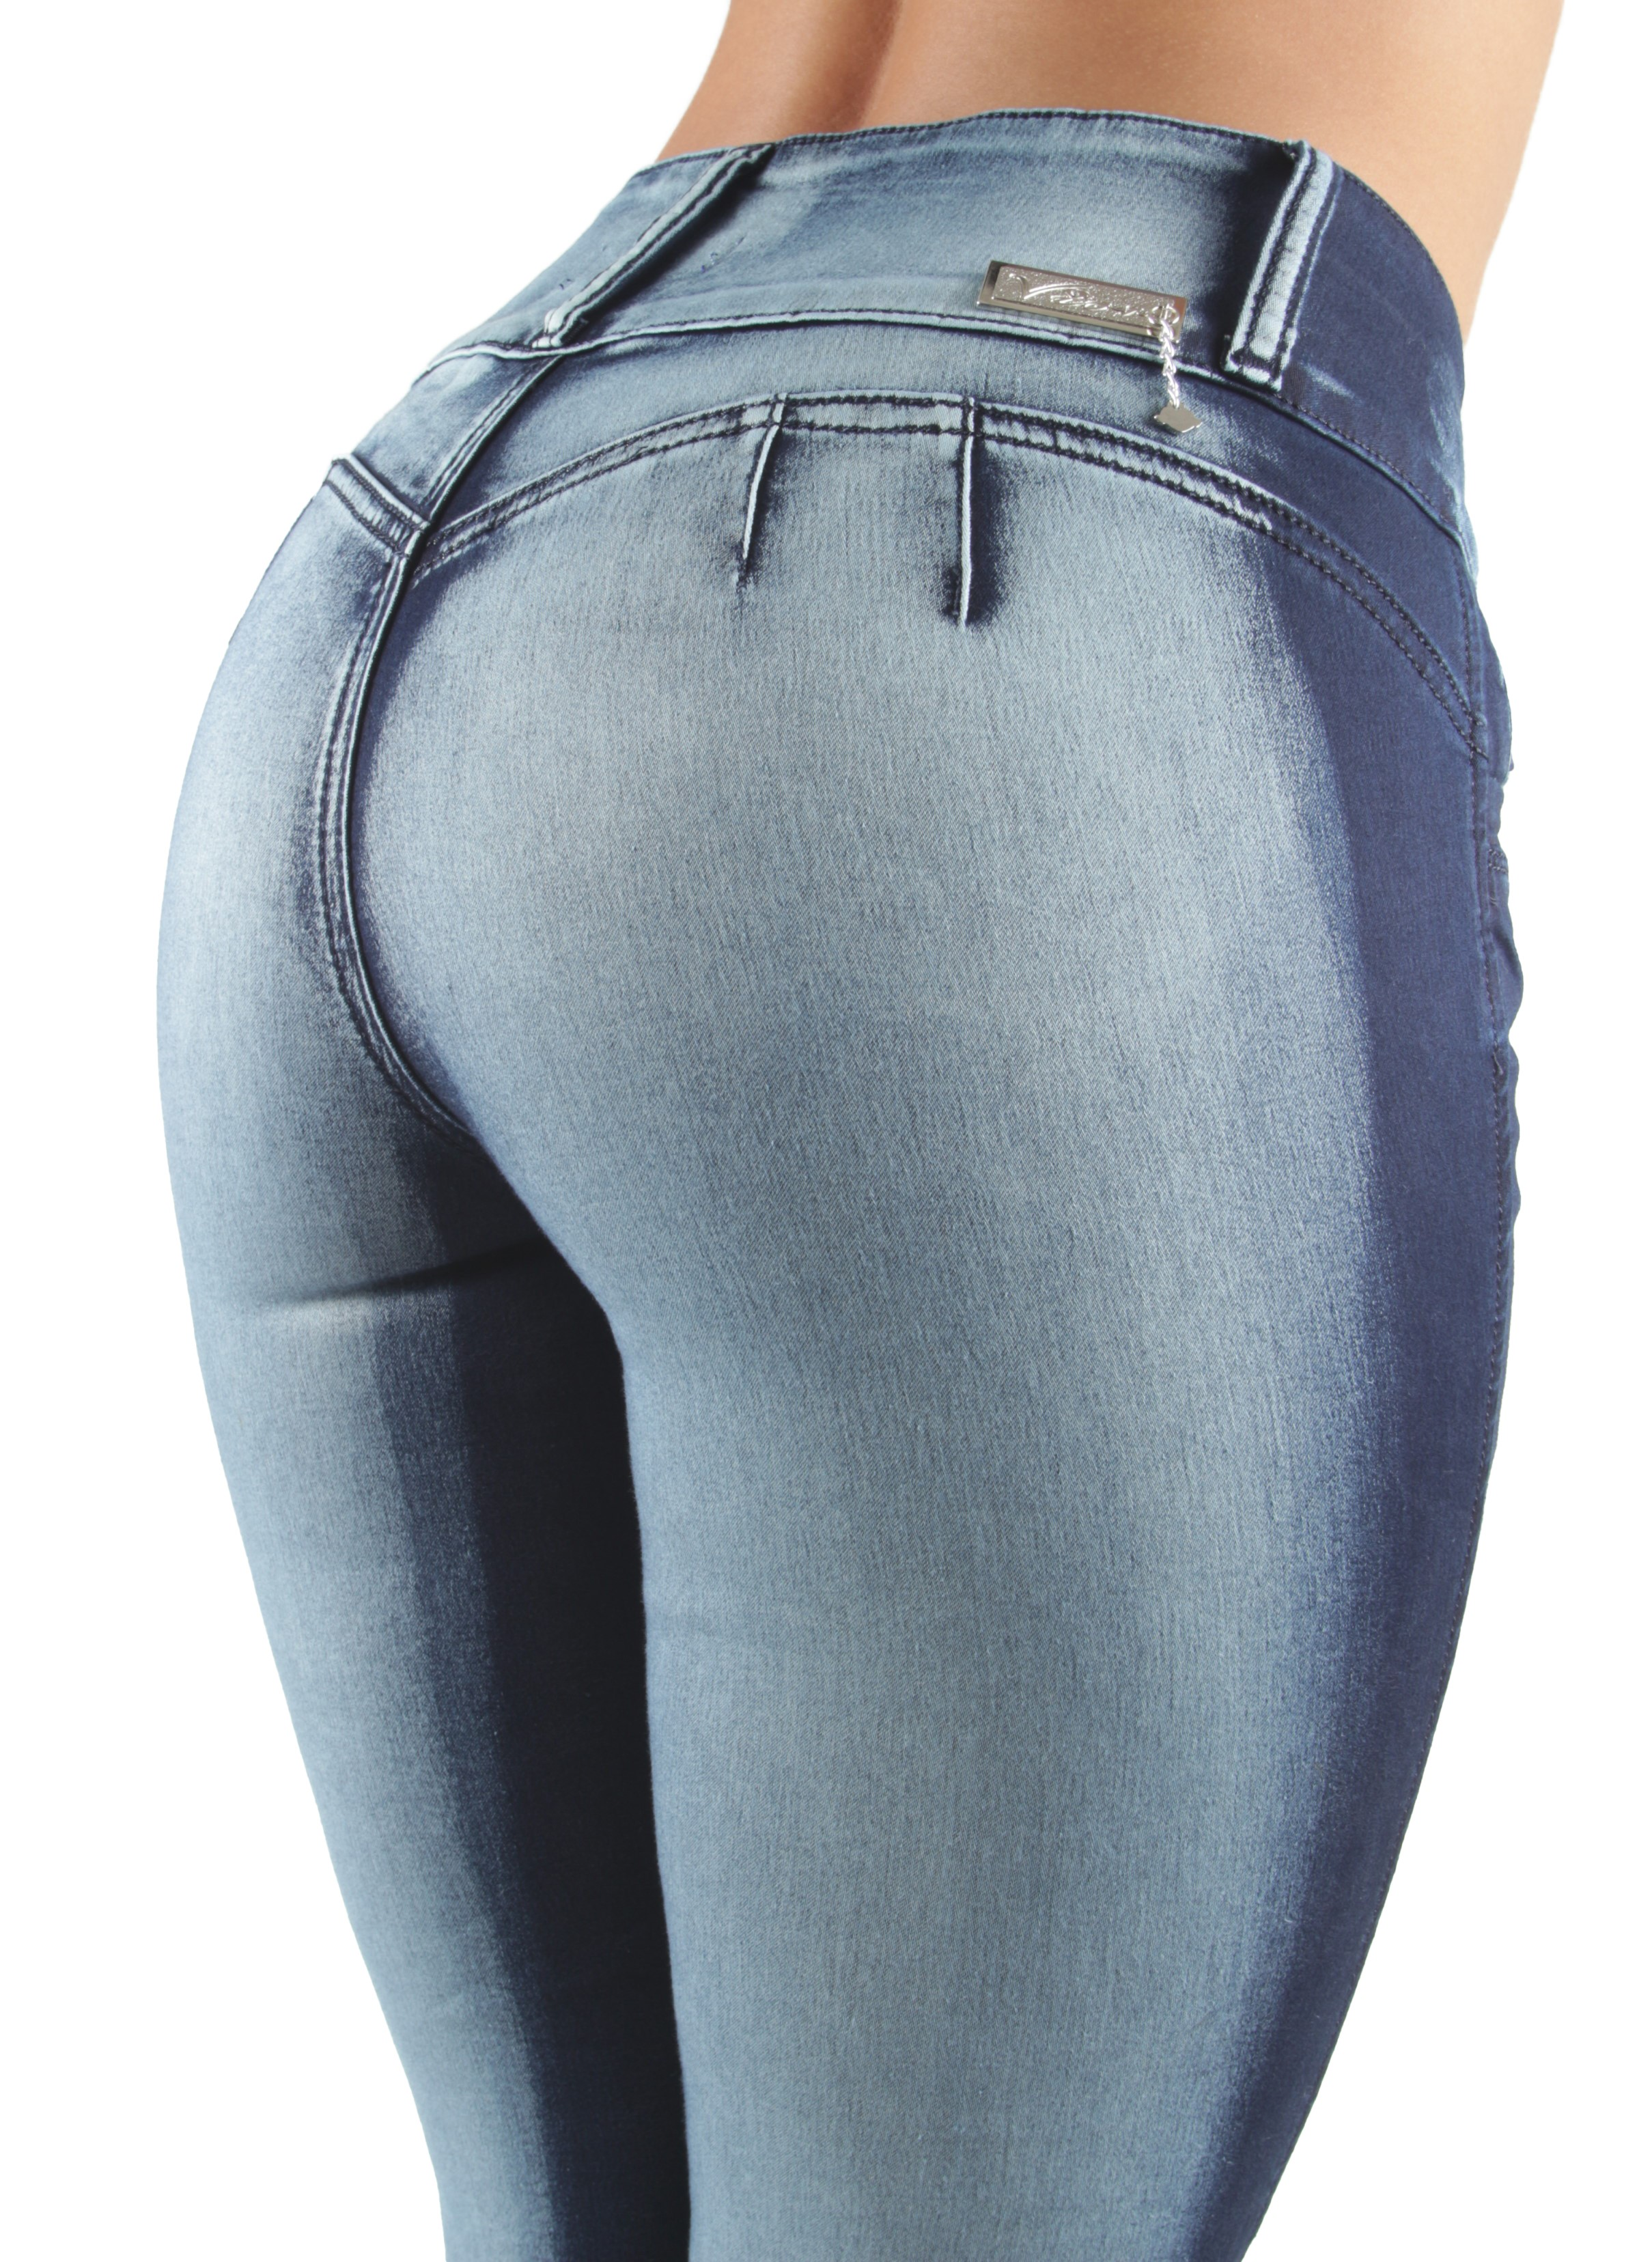 Women/'s Juniors Colombian Design Skinny Jeans Mid Waist Butt Lift Push Up